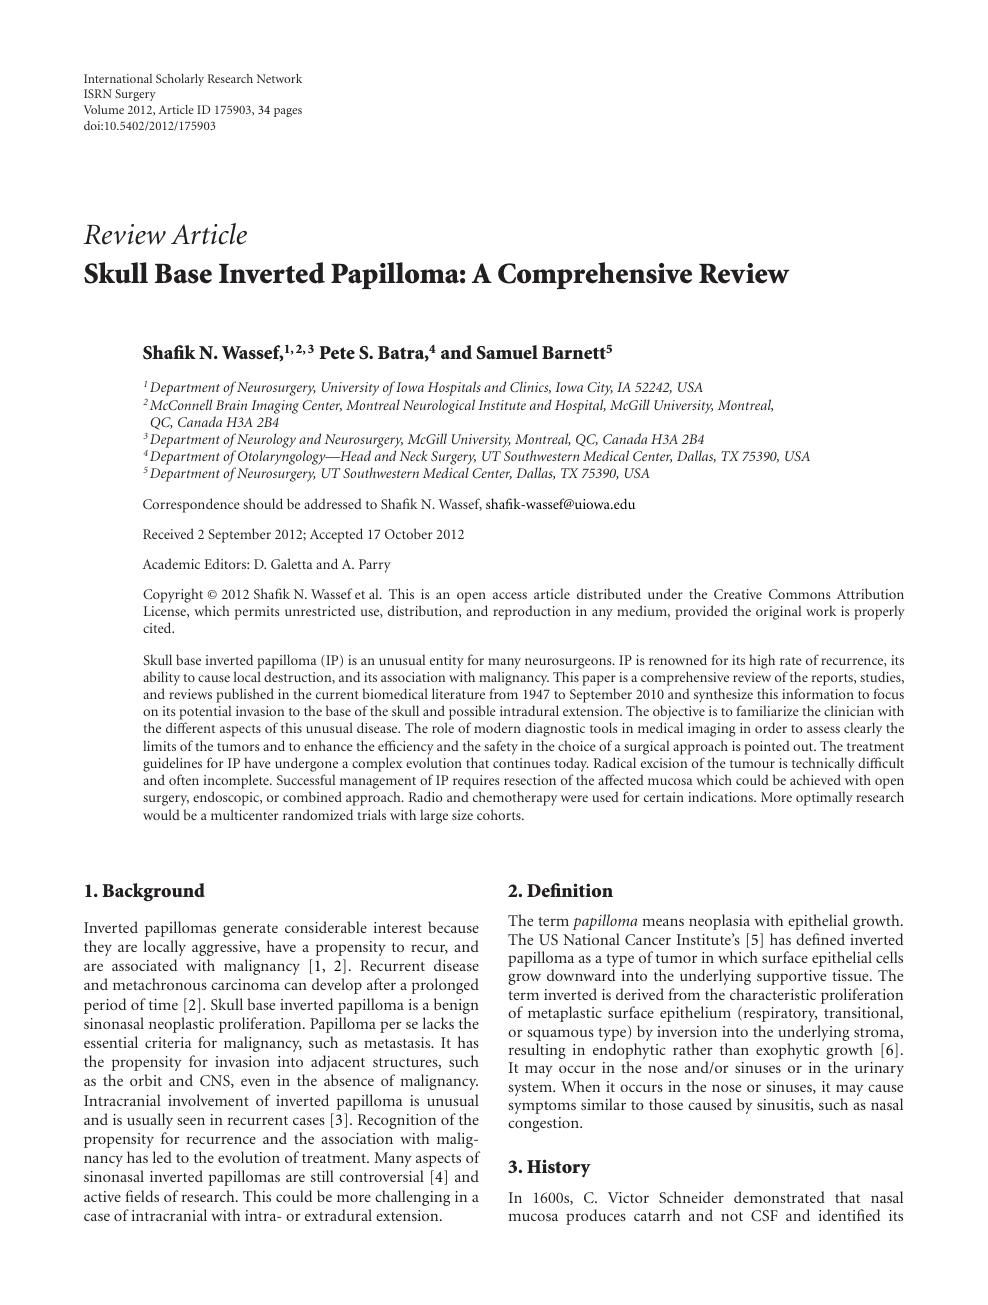 papilloma invertito cause virus hpv na lingua